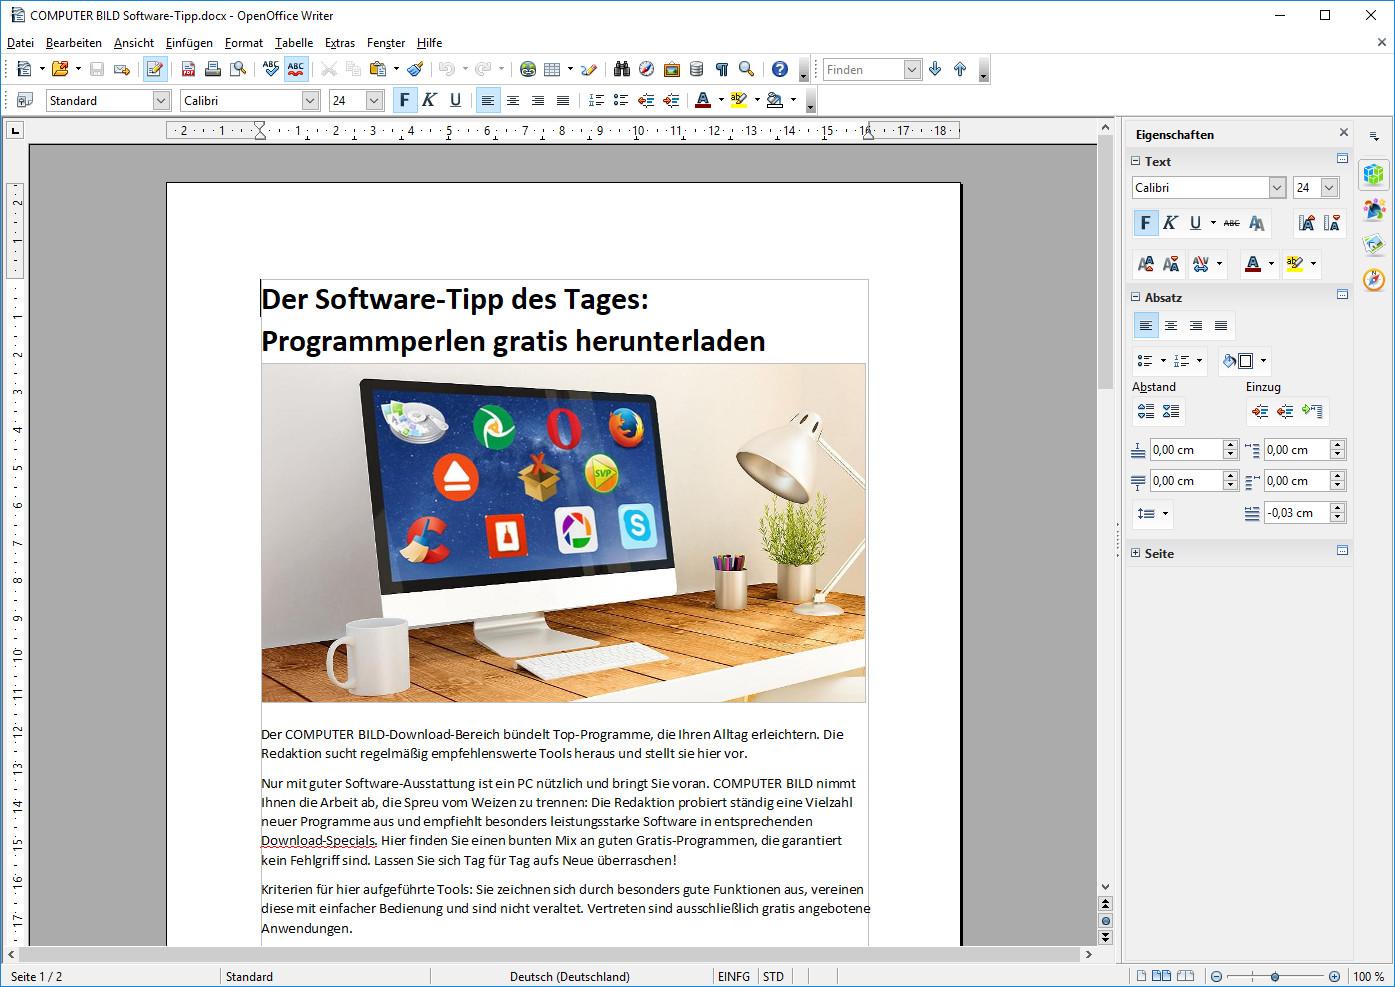 Screenshot 1 - OpenOffice